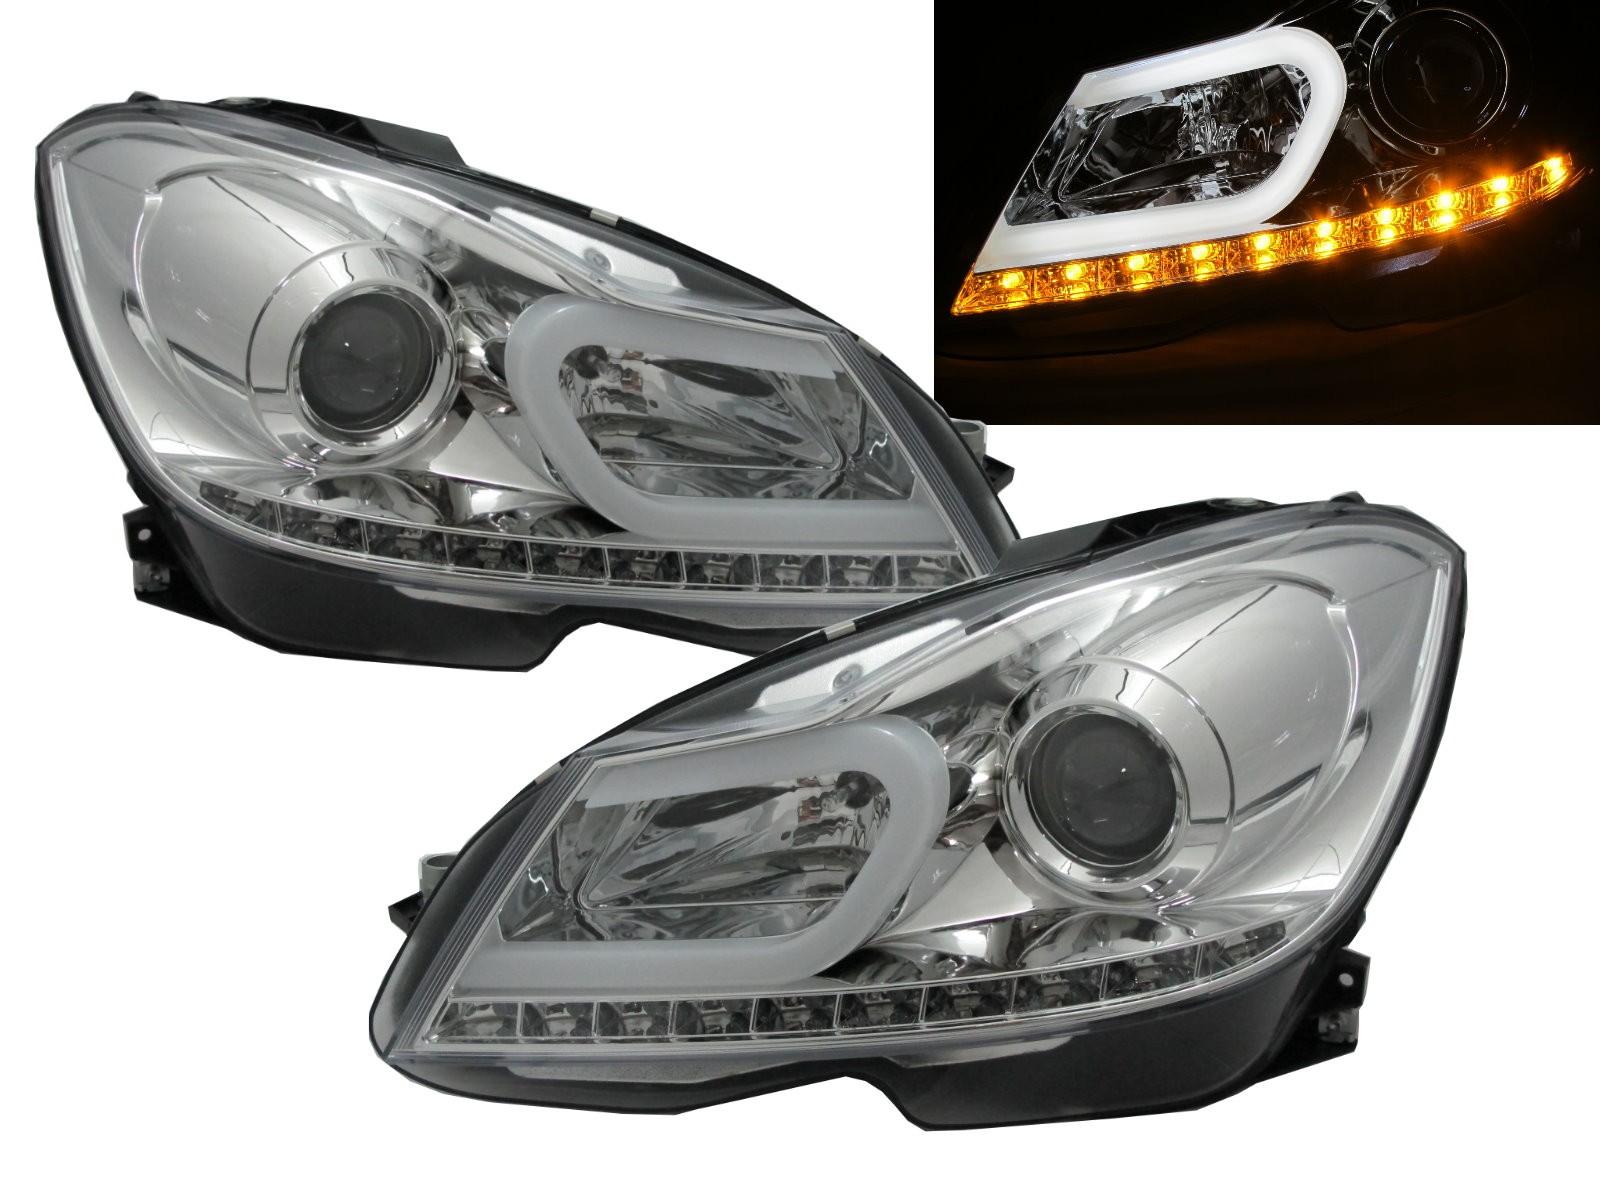 CrazyTheGod C-CLASS W204 2012-2014 FACELIFT Sedan/Wagon/Coupe 2D/4D/5D Projector LED U-Bar Headlight Headlamp Chrome for Mercedes-Benz RHD